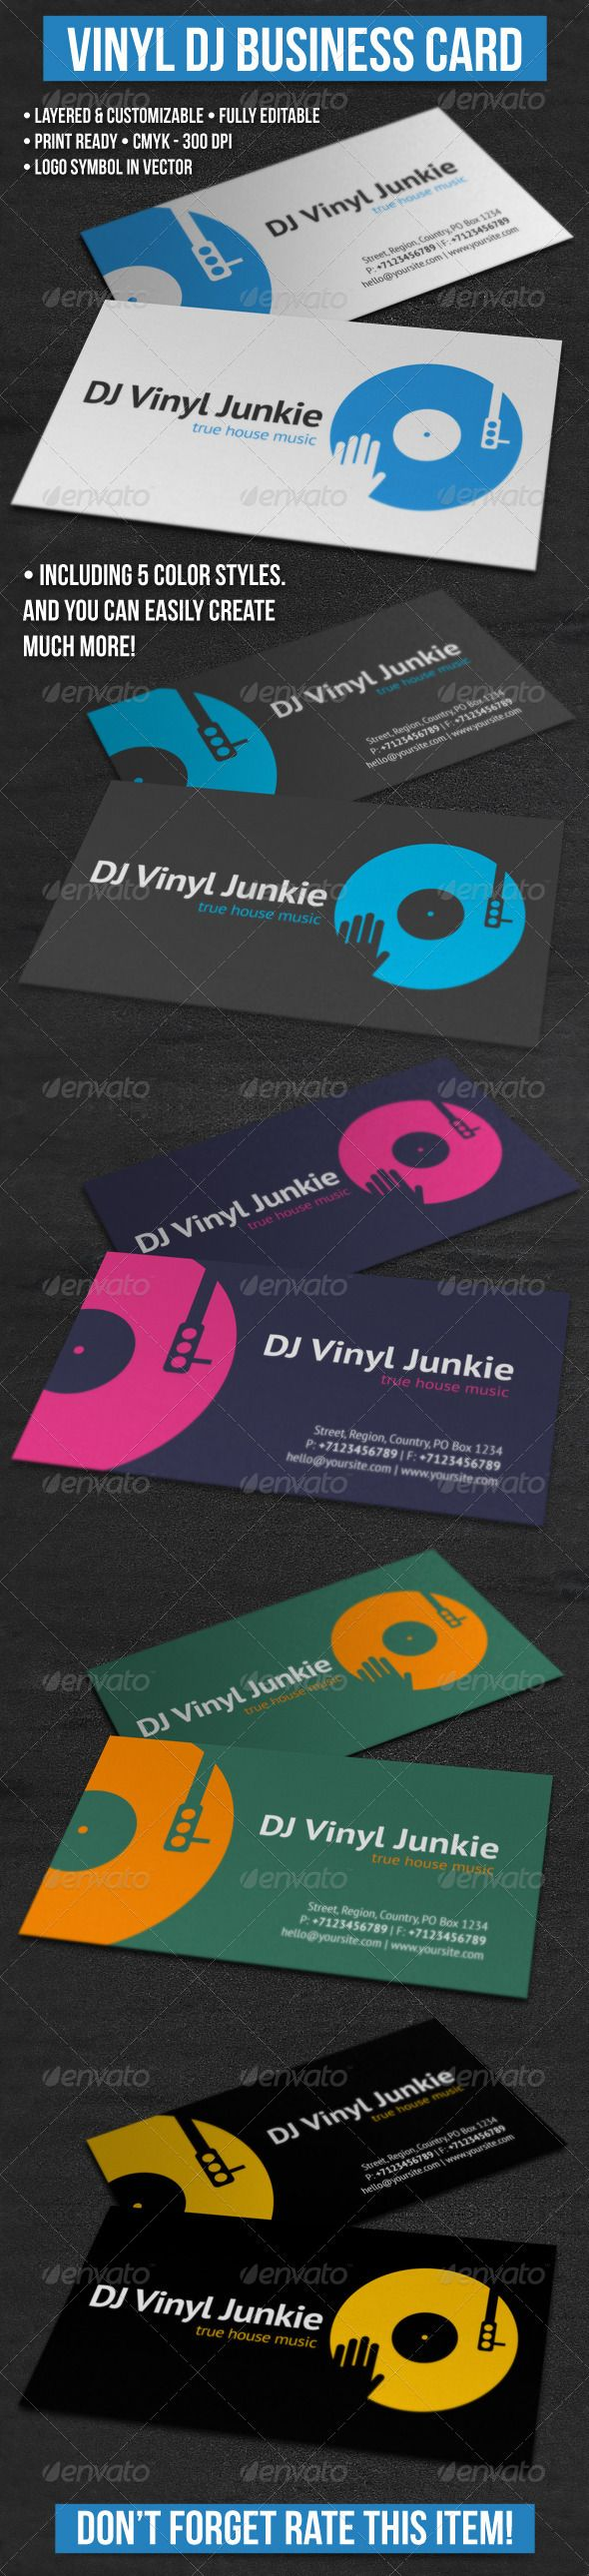 Vinyl DJ Business Card   Dj business cards, Business cards and ...